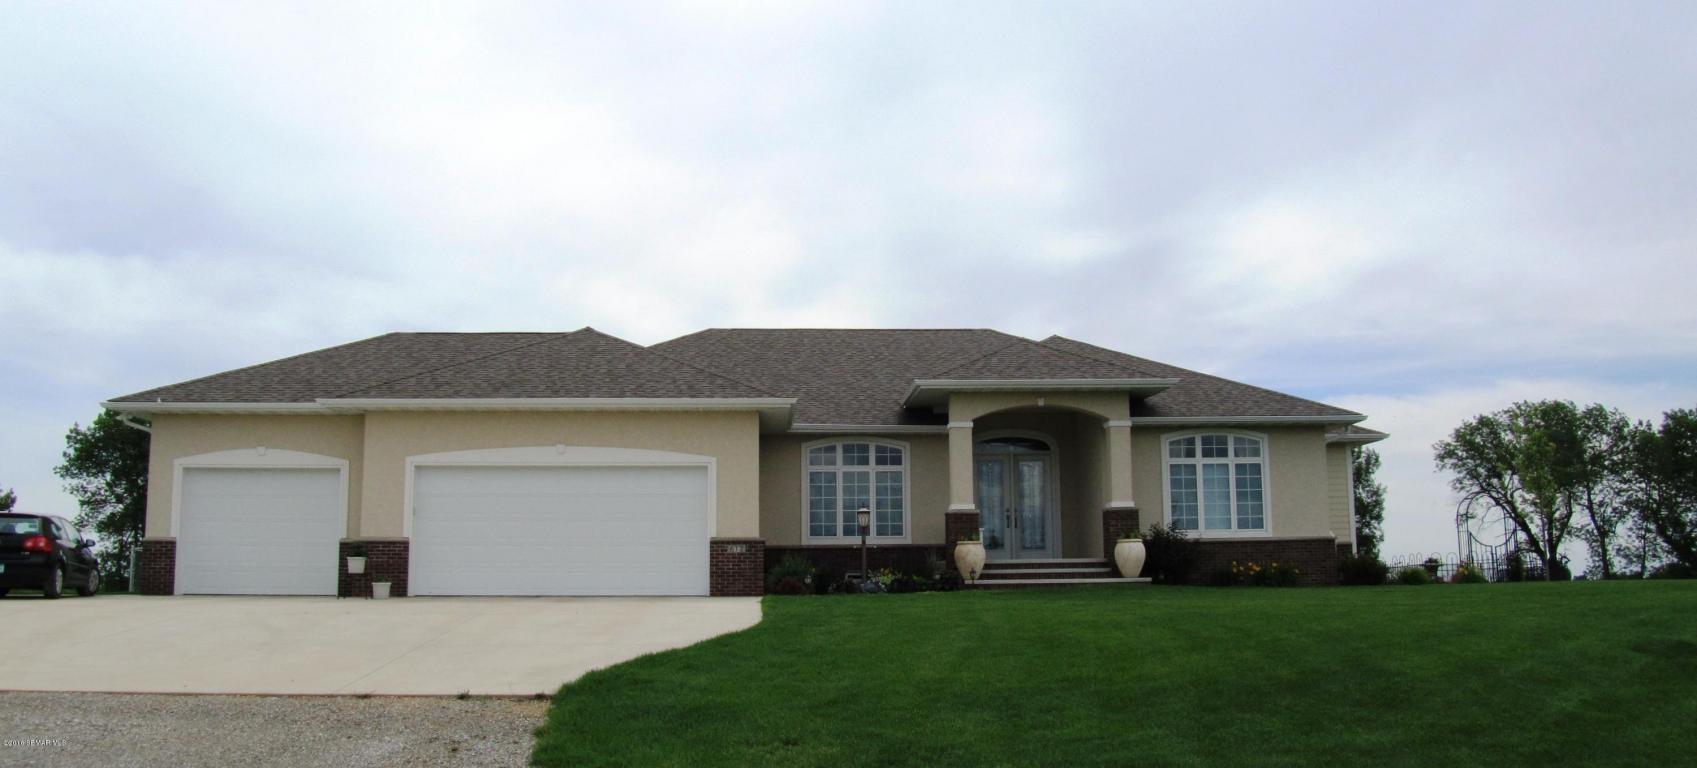 Real Estate for Sale, ListingId: 36796179, Geneva,MN56035